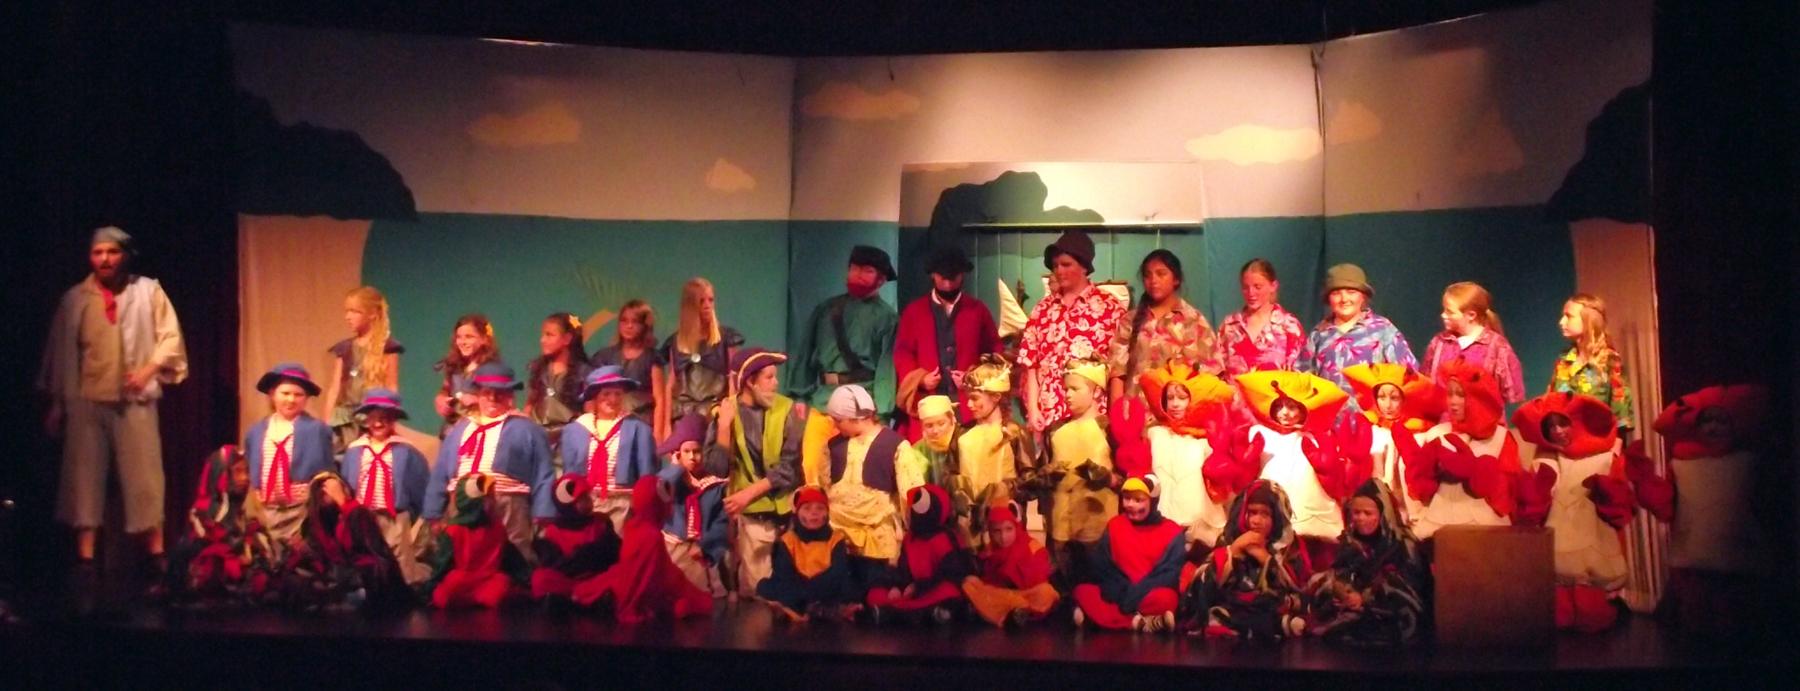 Ahoy! Talent galore from Missoula Children's Theatre